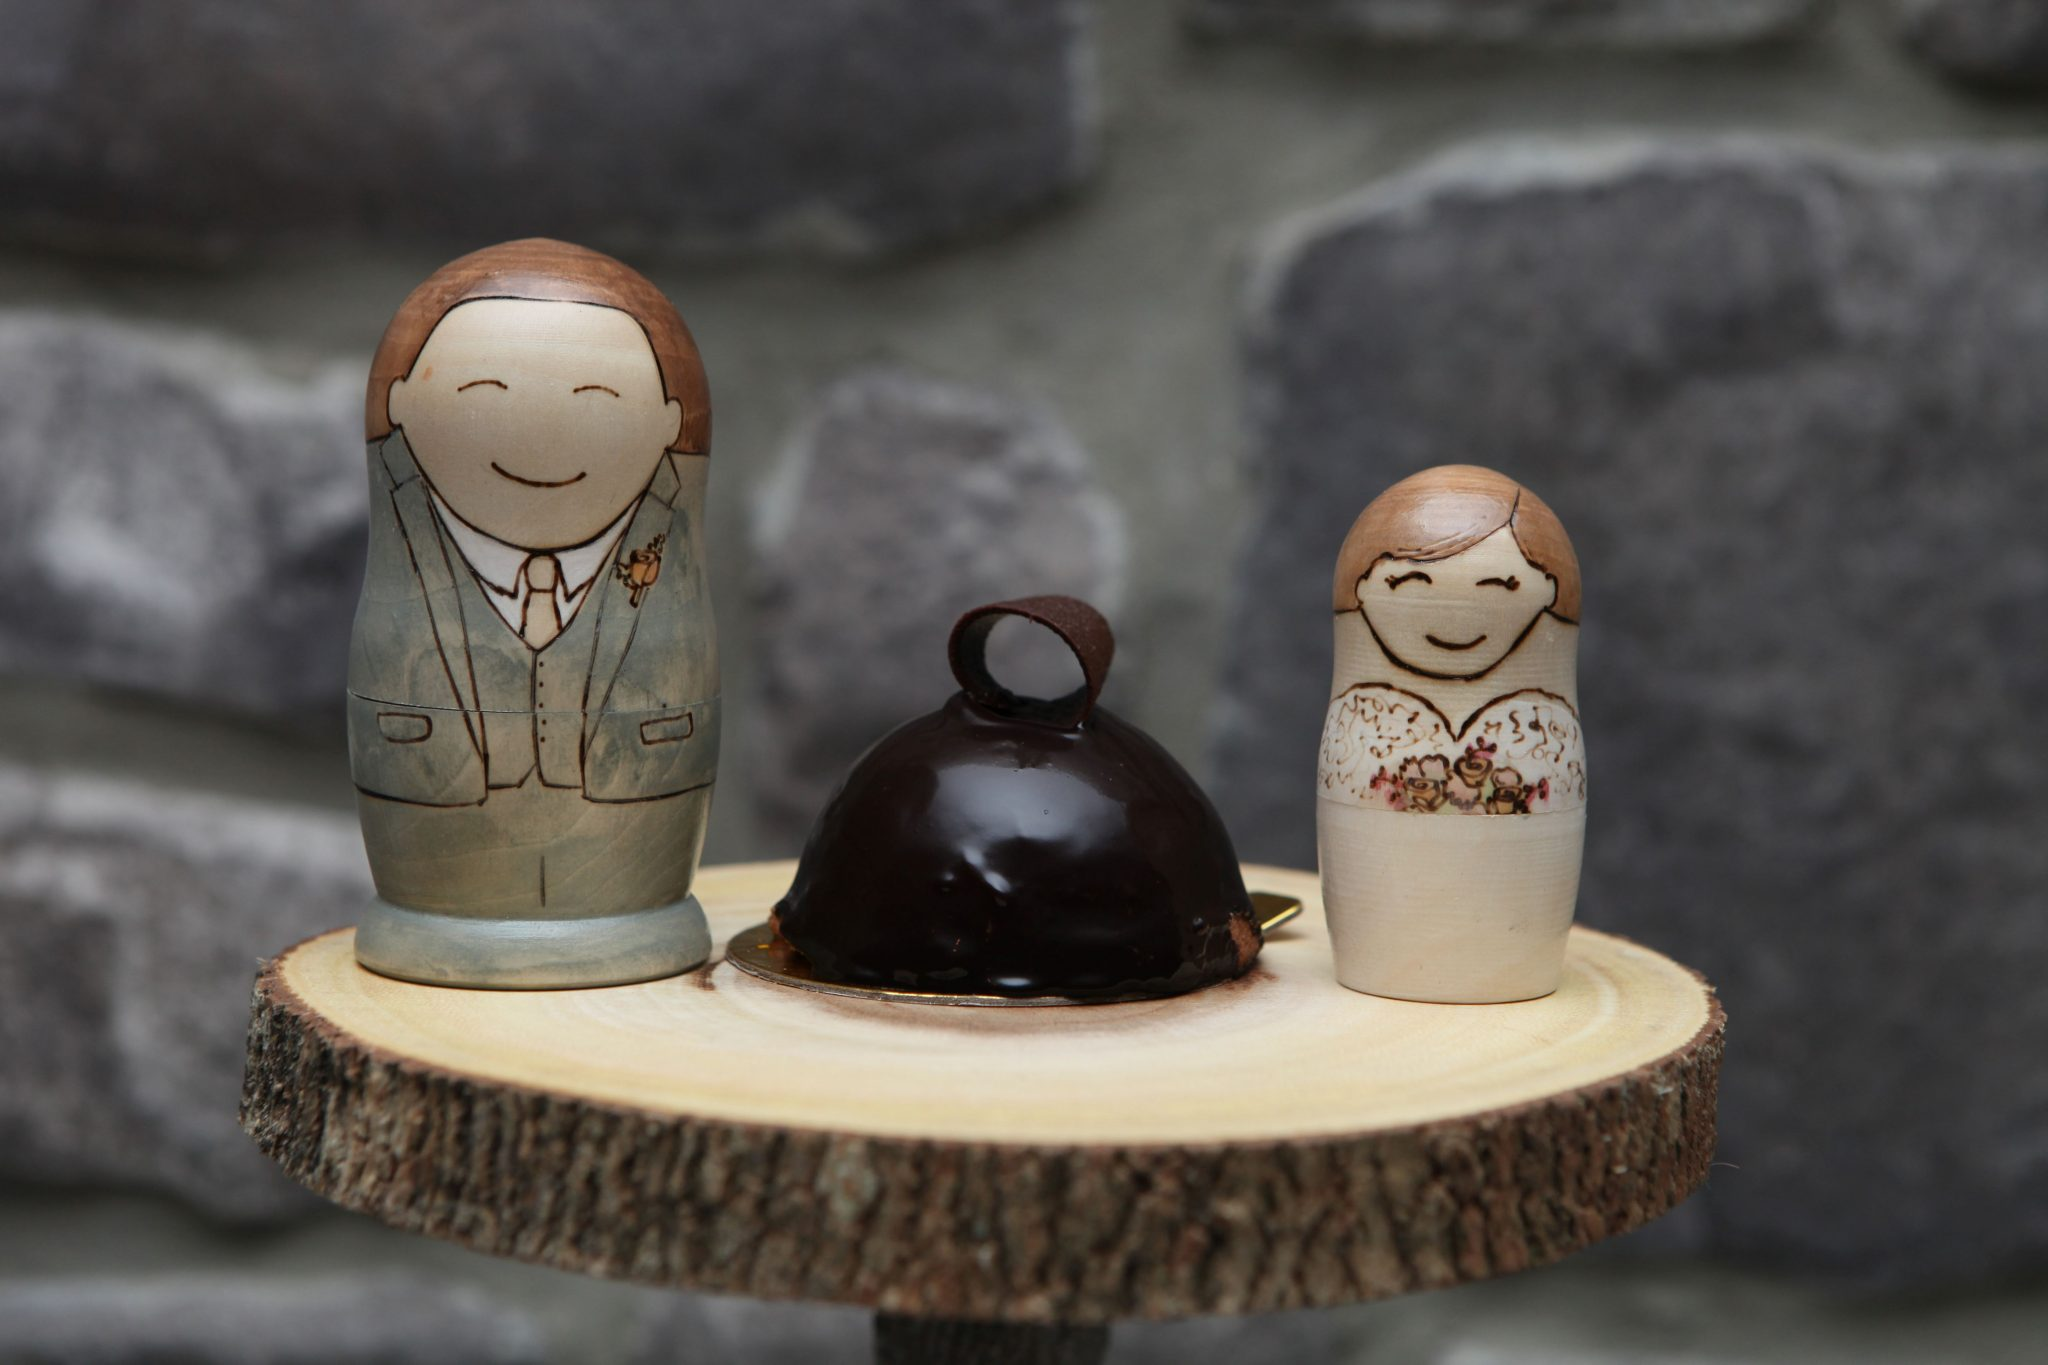 Rustic wedding cake idea